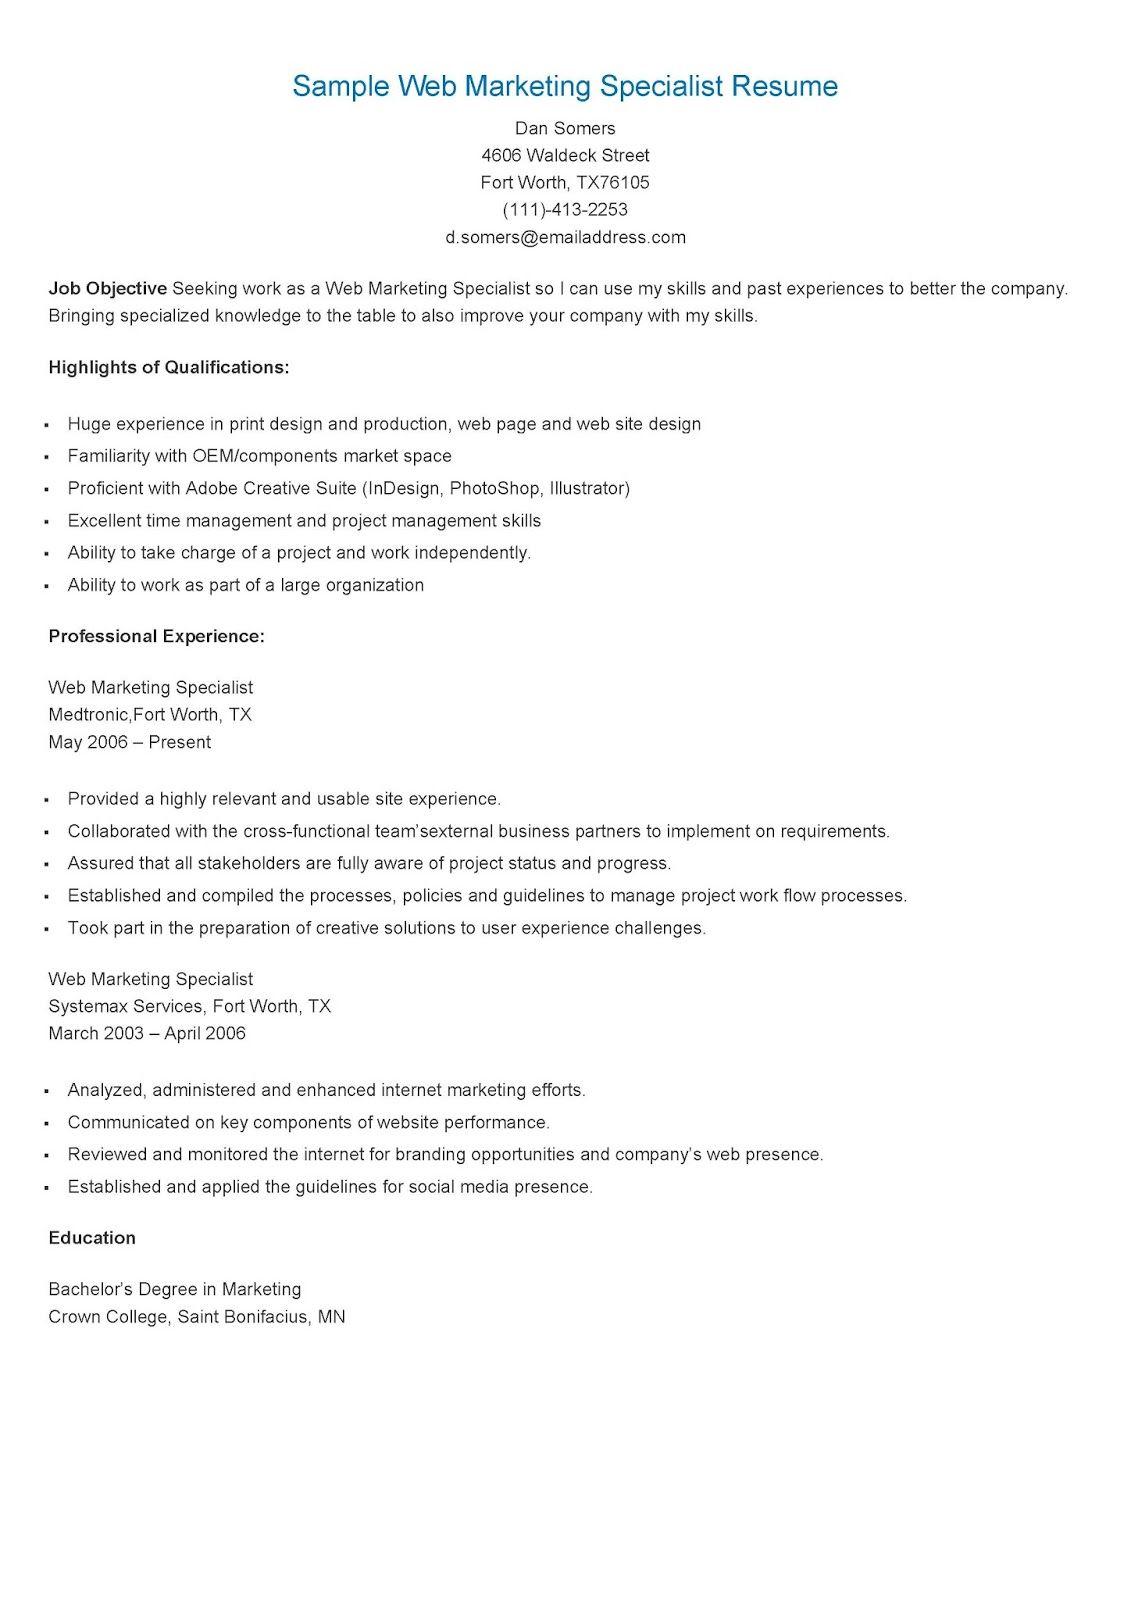 Sample Web Marketing Specialist Resume Resume, Sample